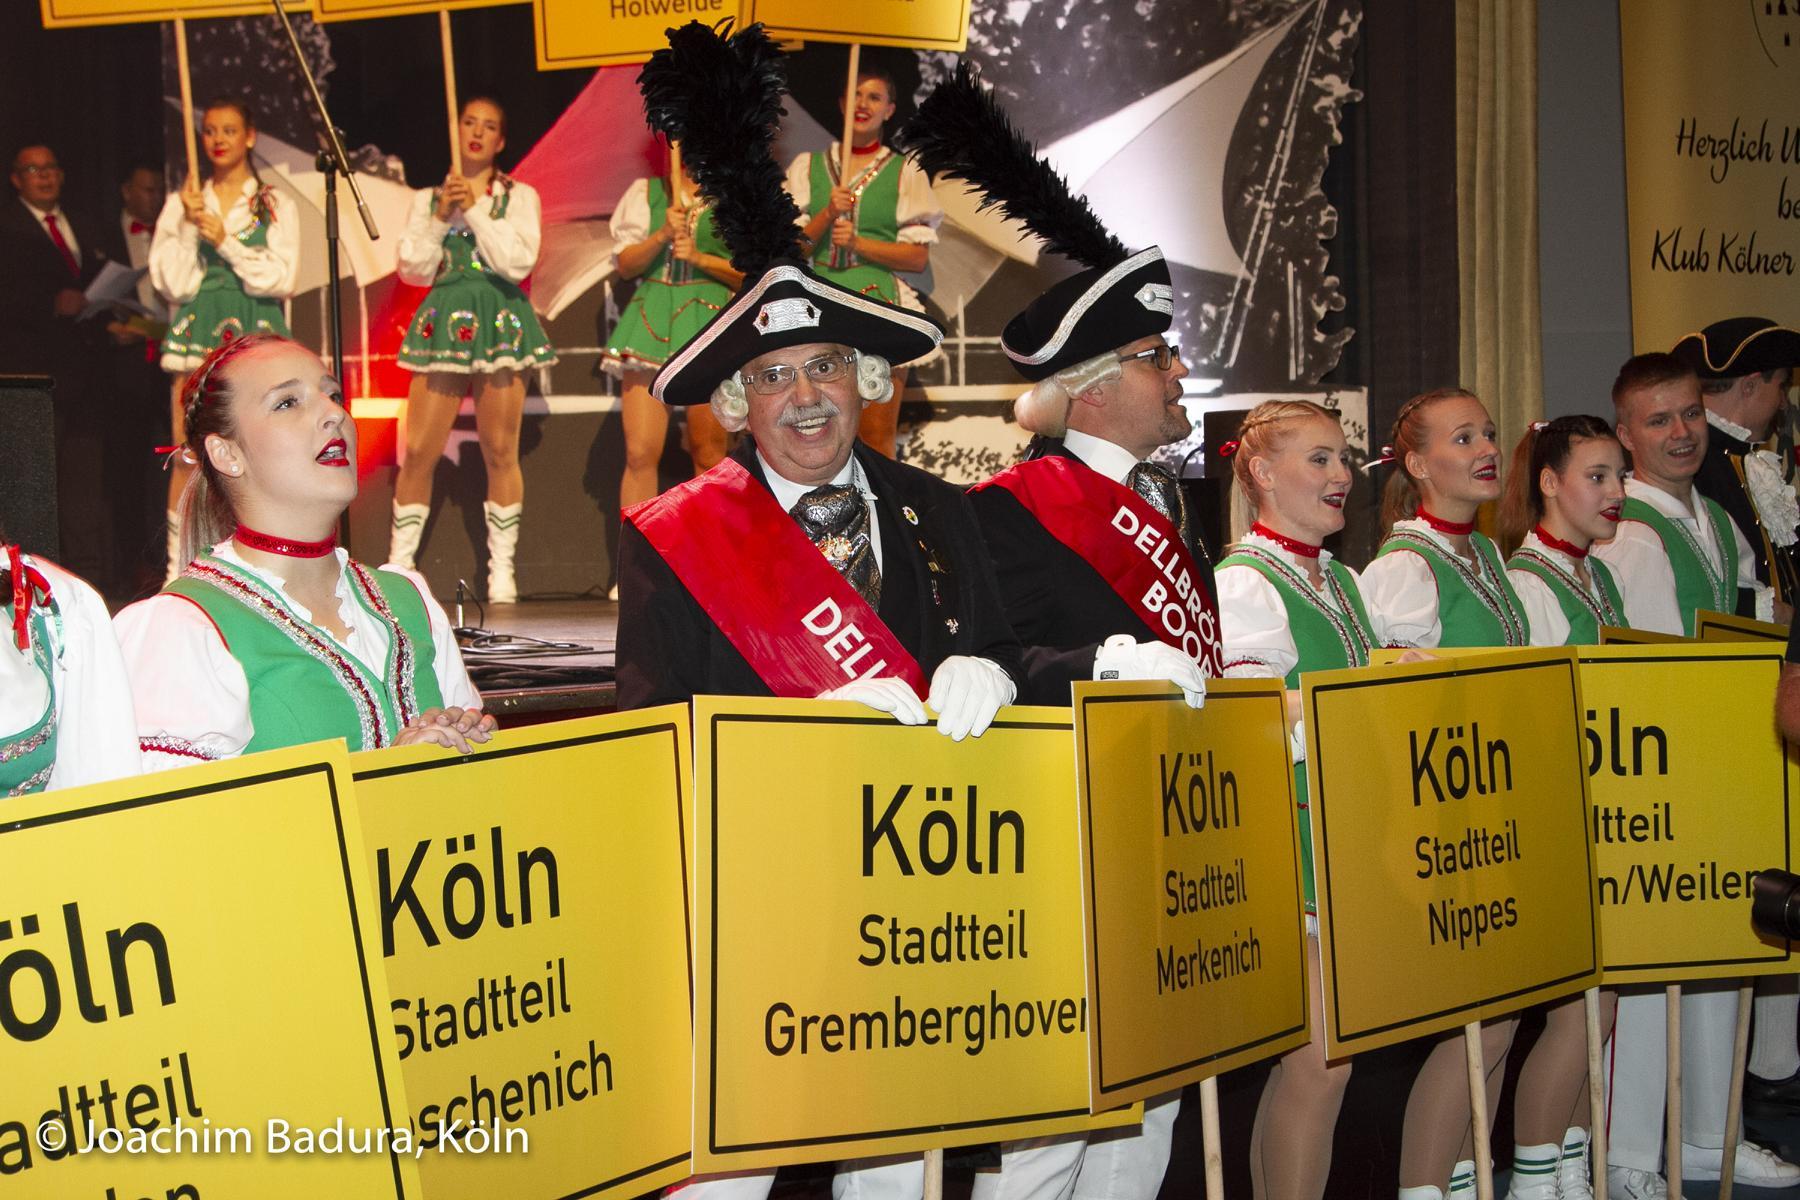 Klub Kölner Karnevalisten